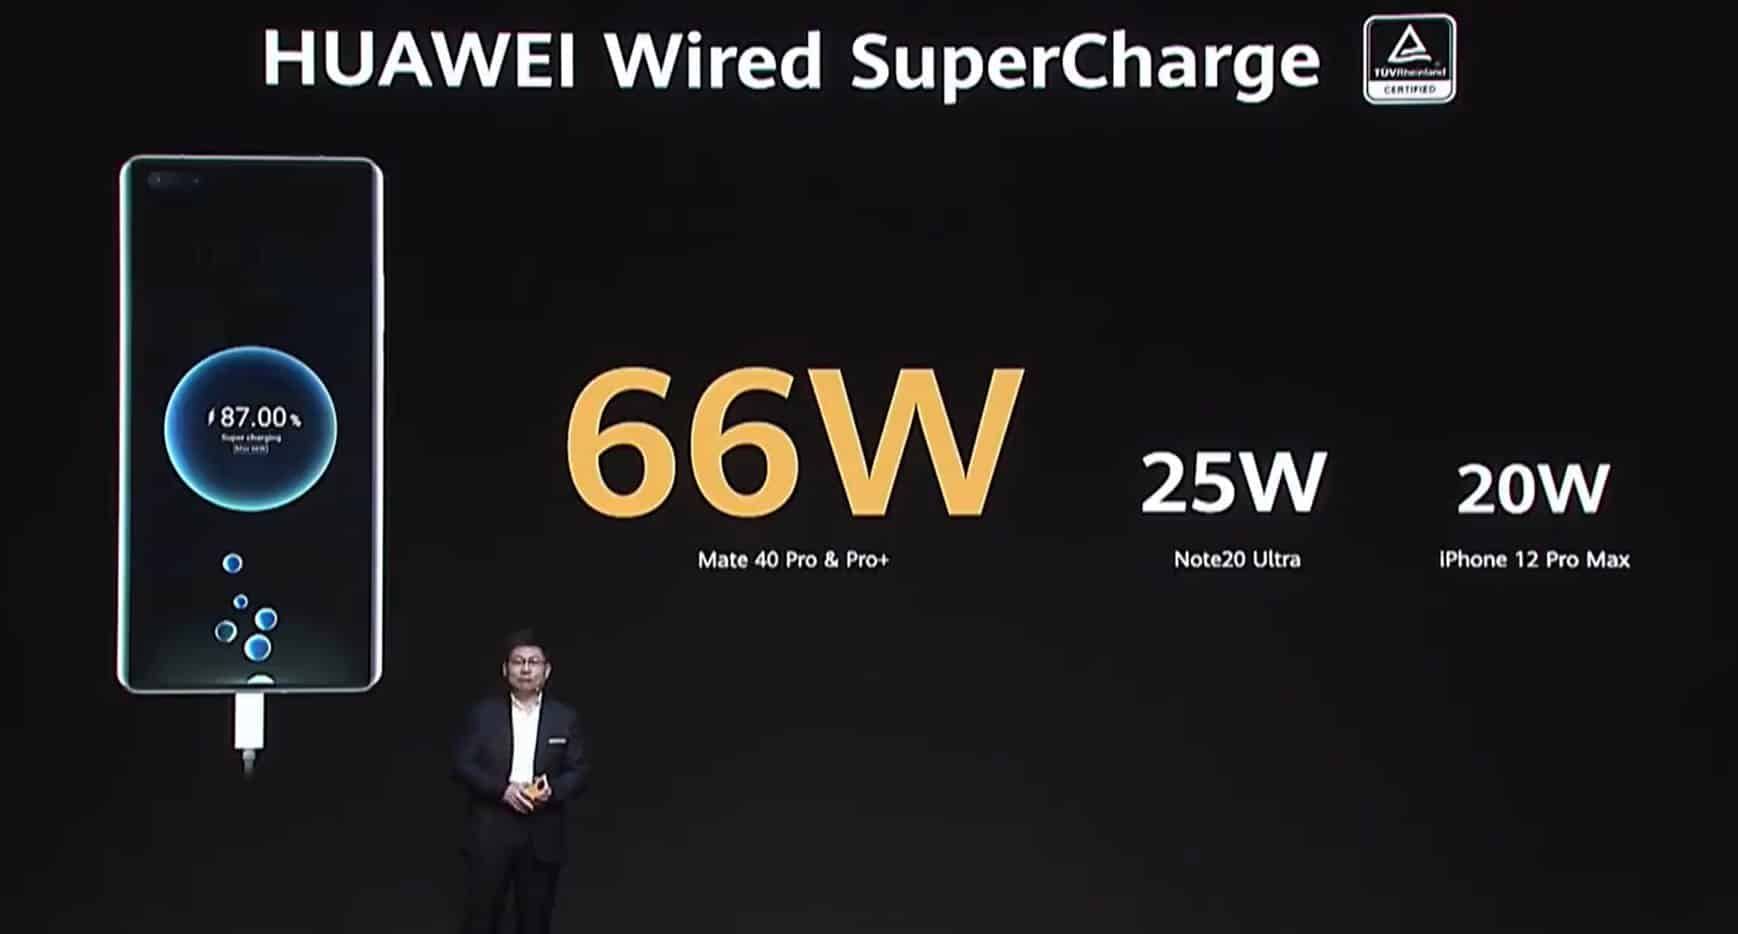 Huawei Mate 40 charging